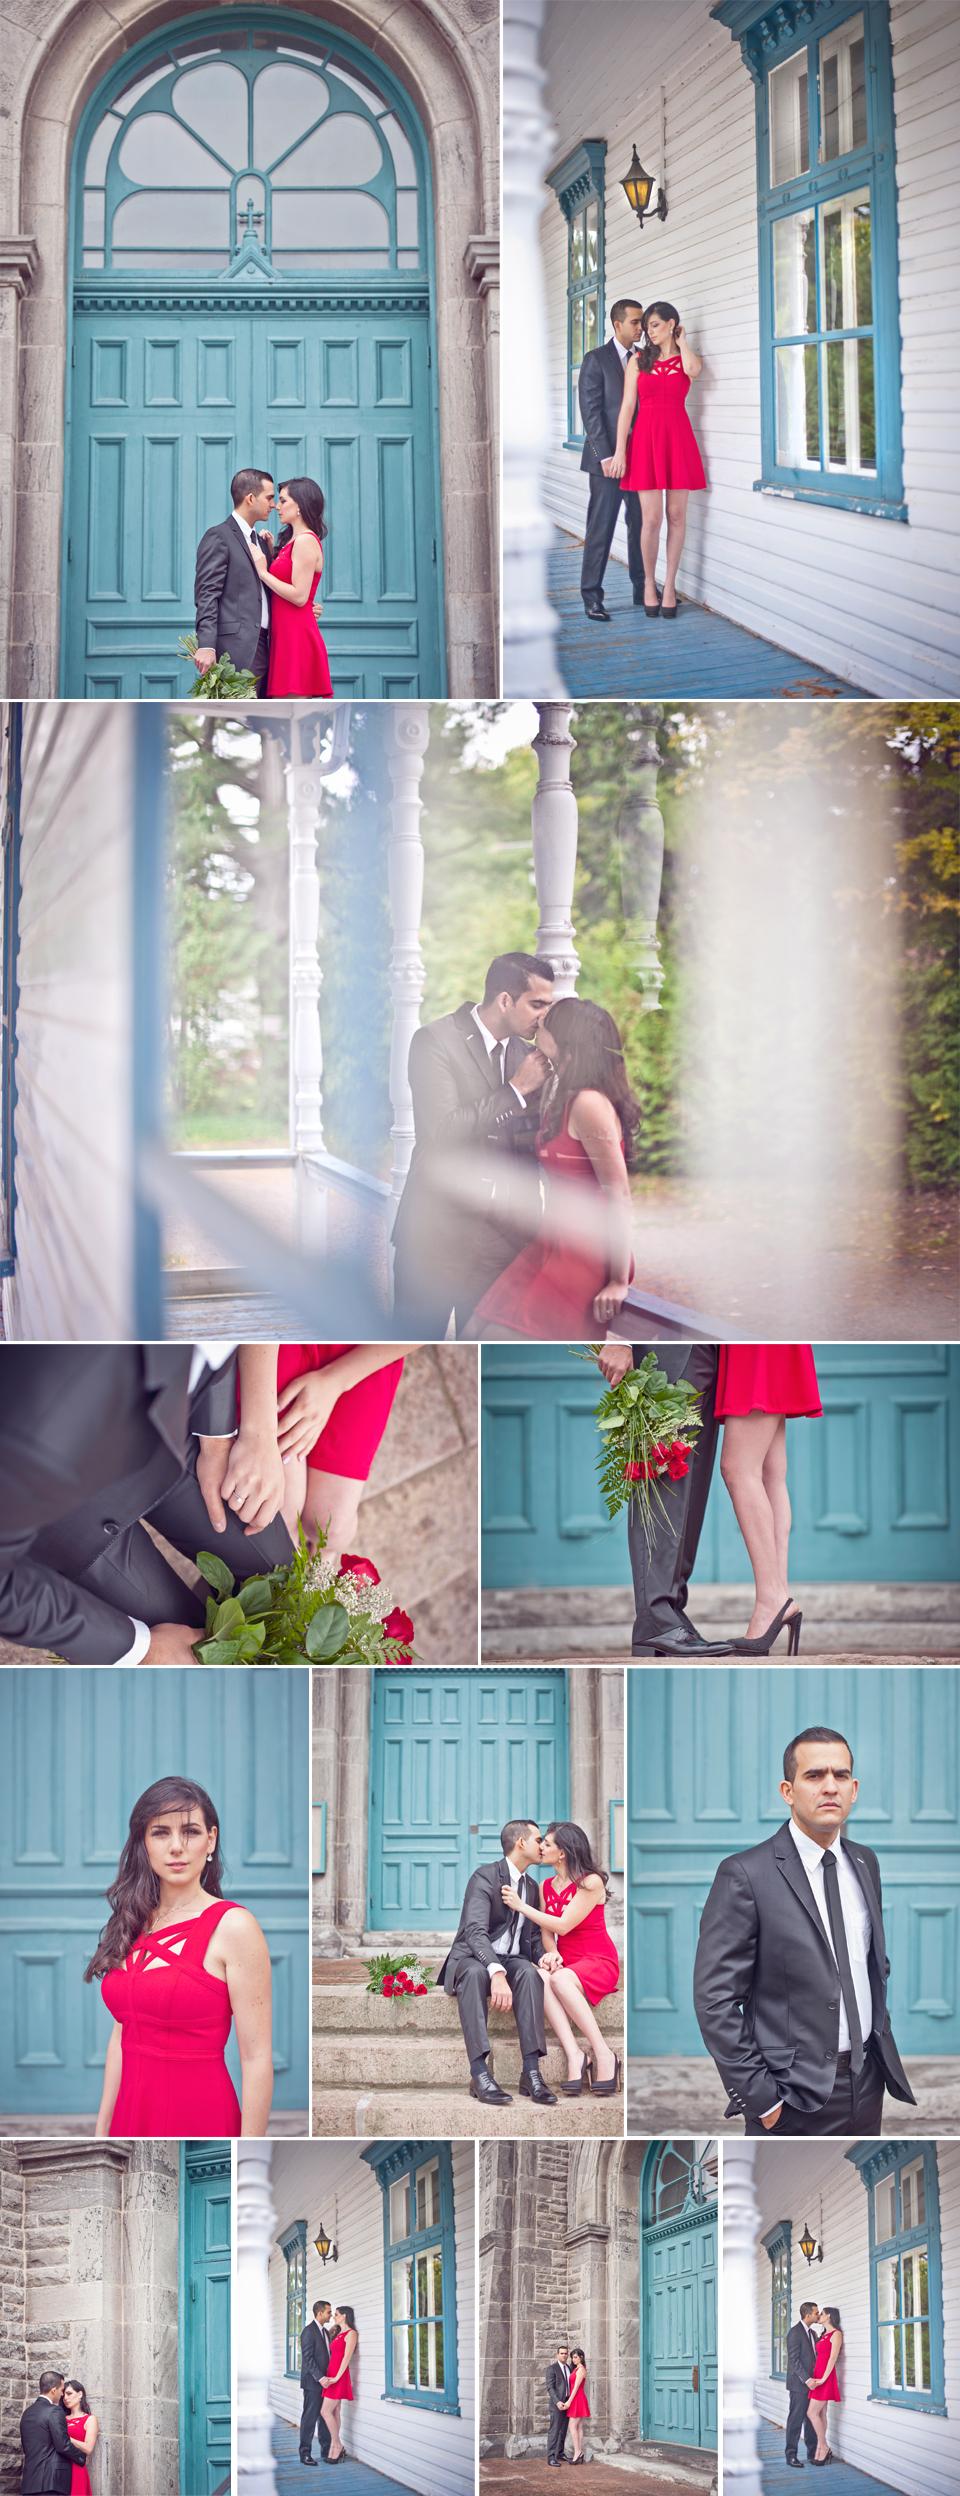 Montreal Wedding Photographer   Engagement Photo   Sainte-Agathe-des-Monts Quebec   LMP wedding photography and videography